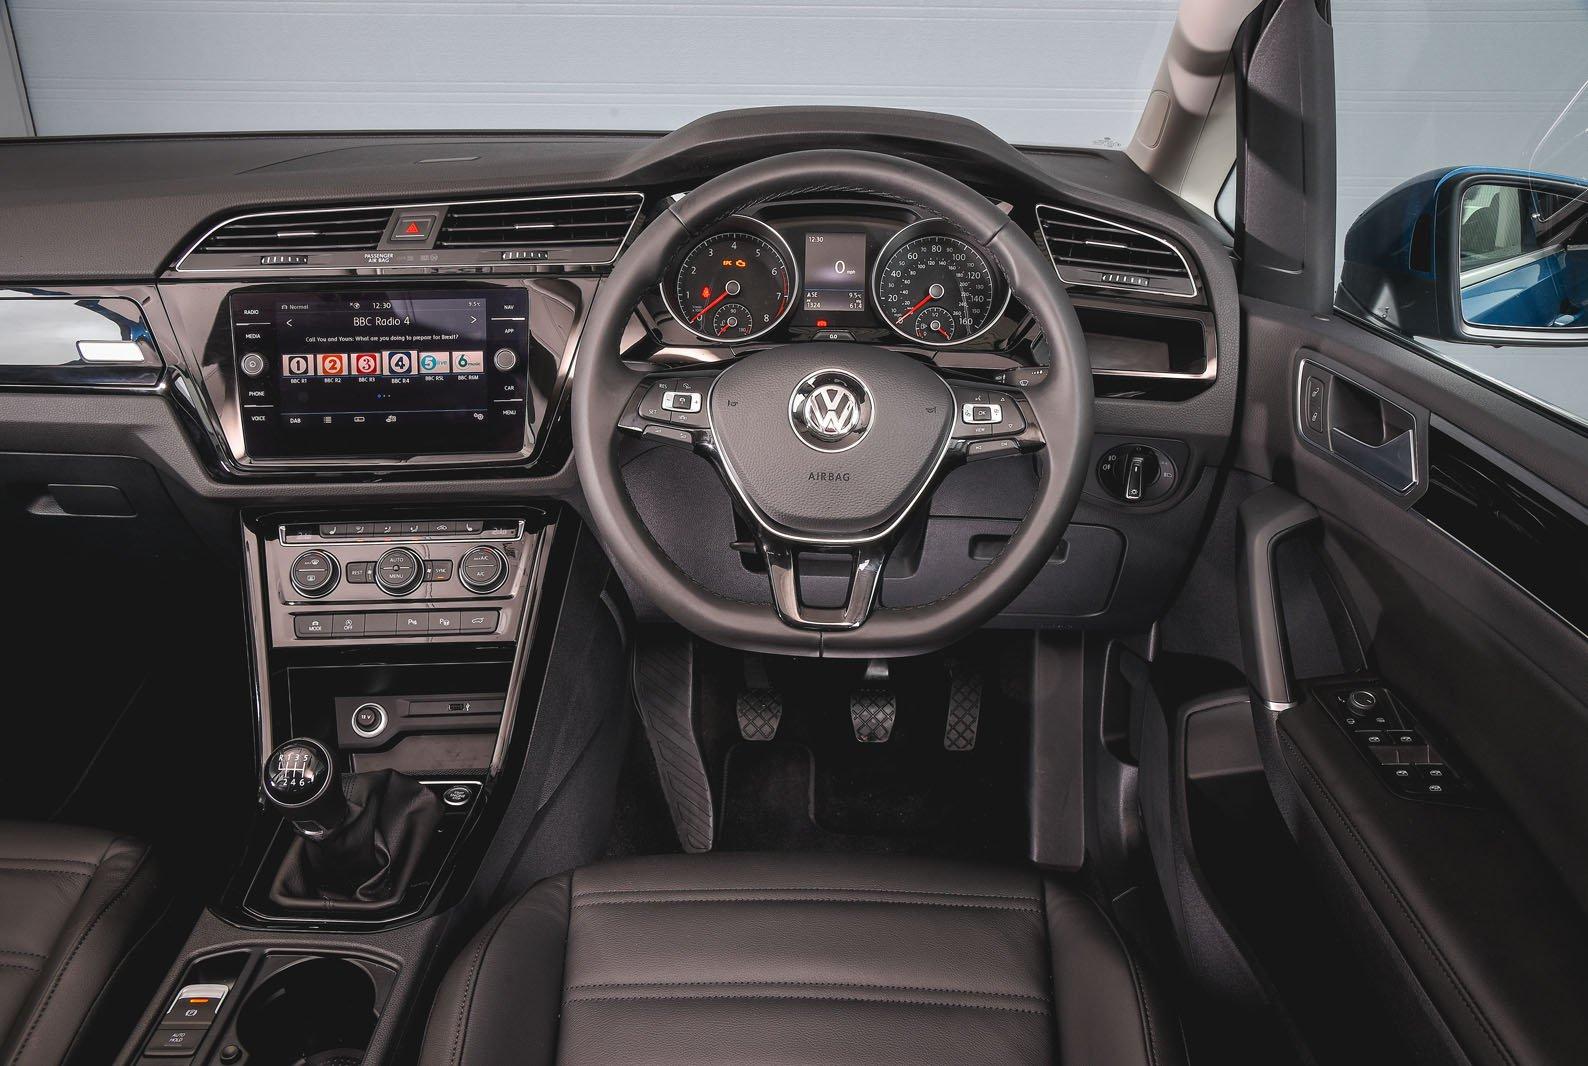 9: Volkswagen Touran 1.6 TDI 115 - interior